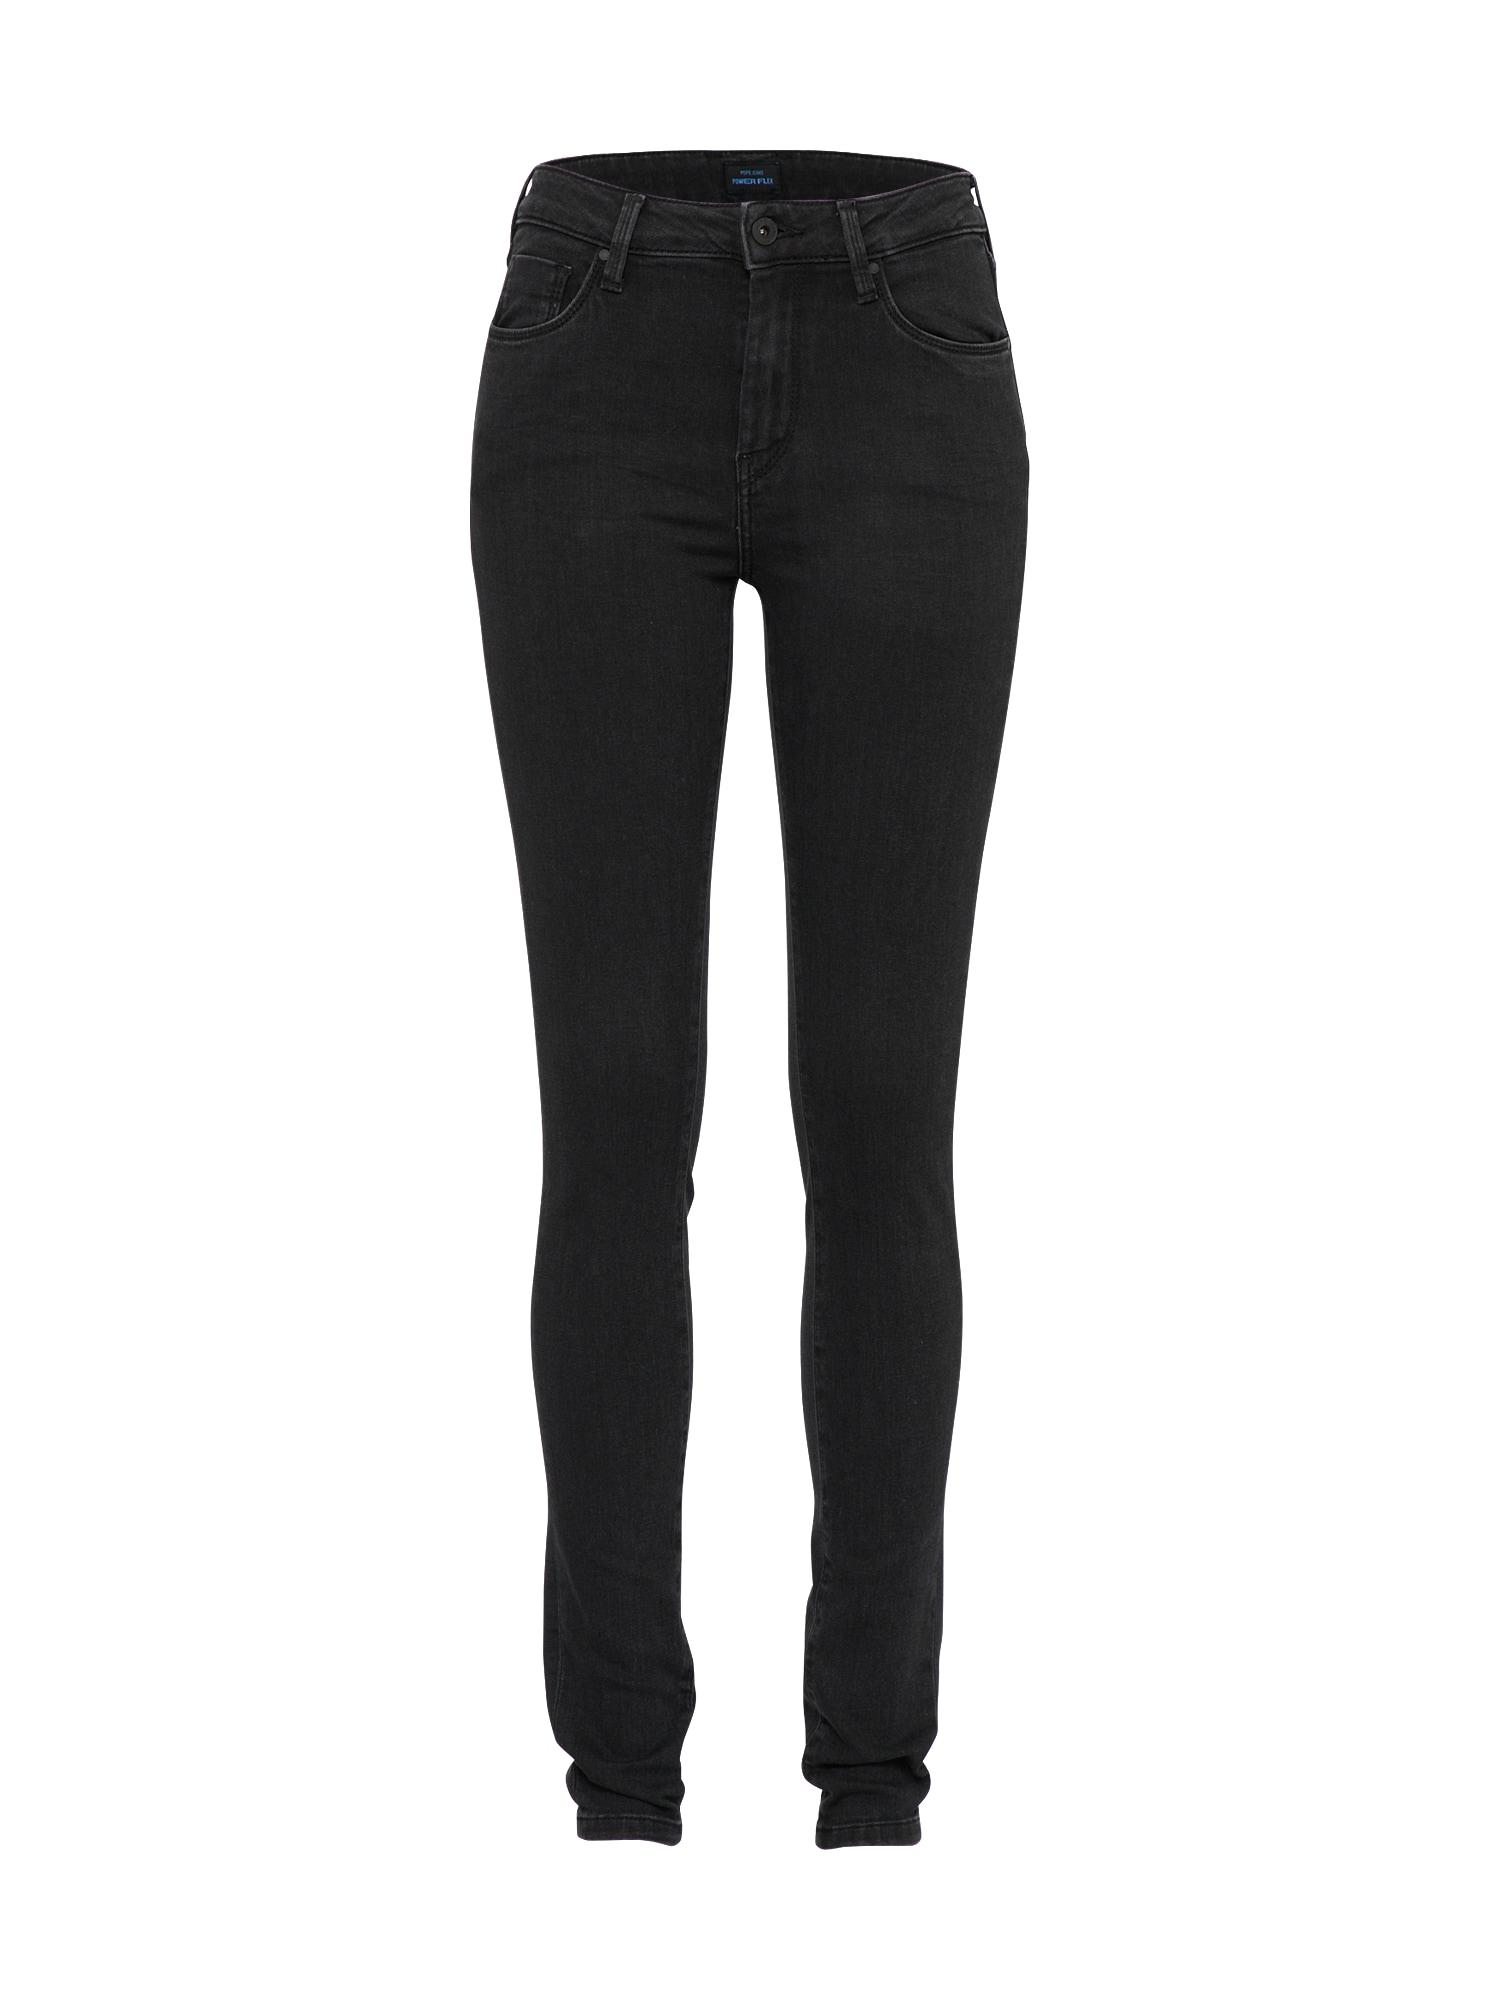 Pepe Jeans Dames Jeans Regent black denim